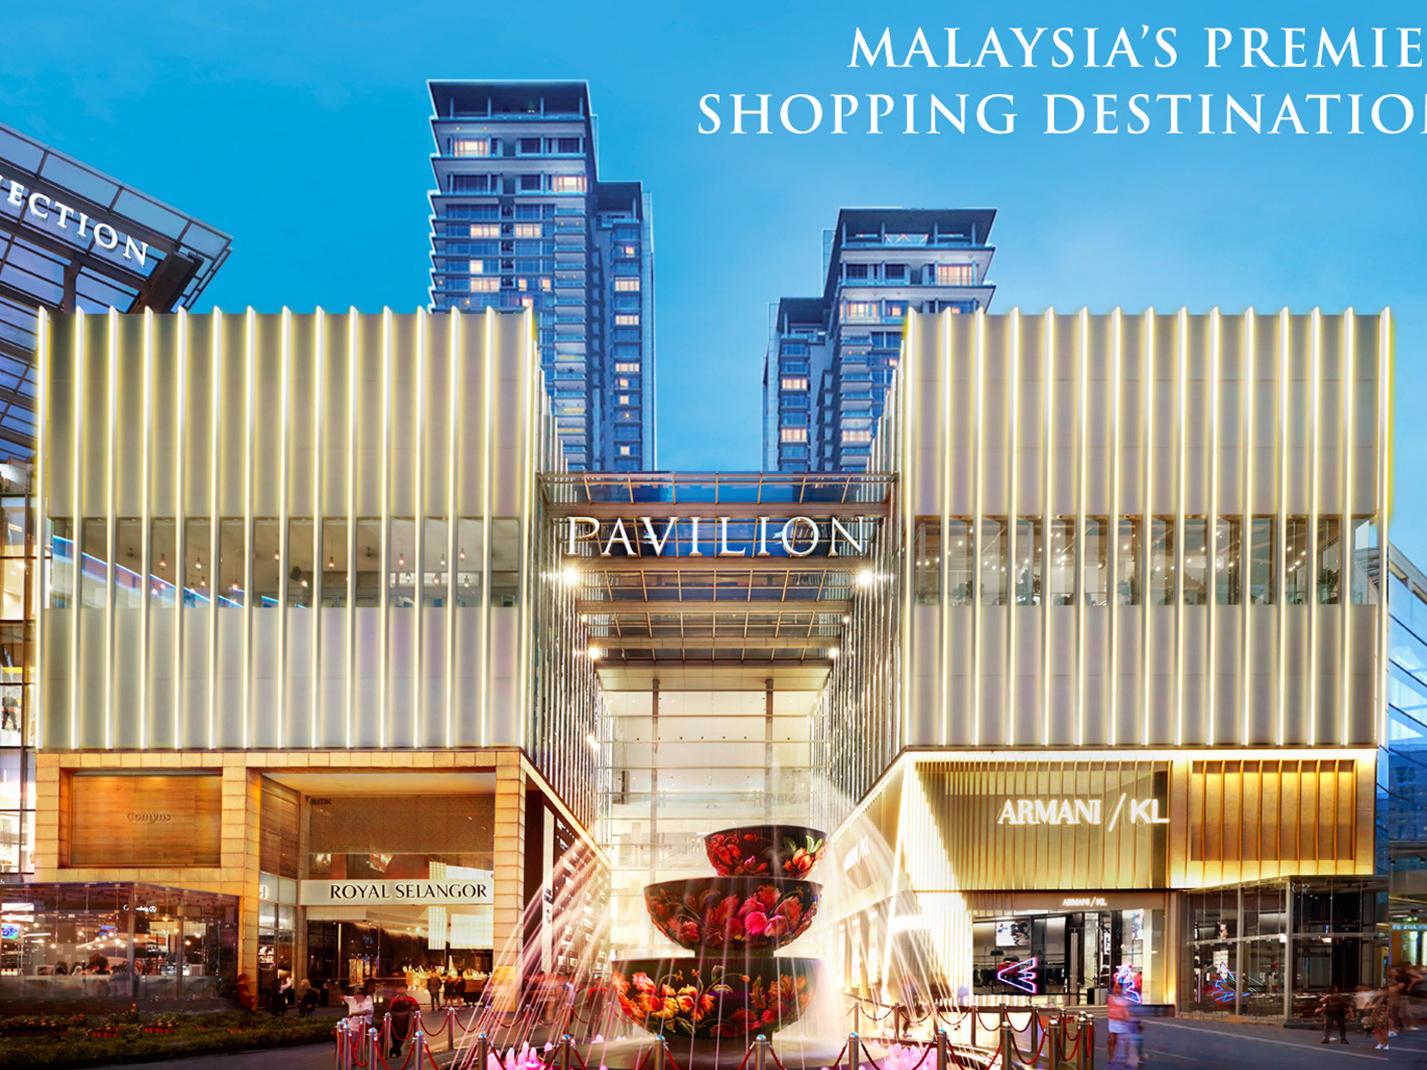 Facade of Pavilion Mall